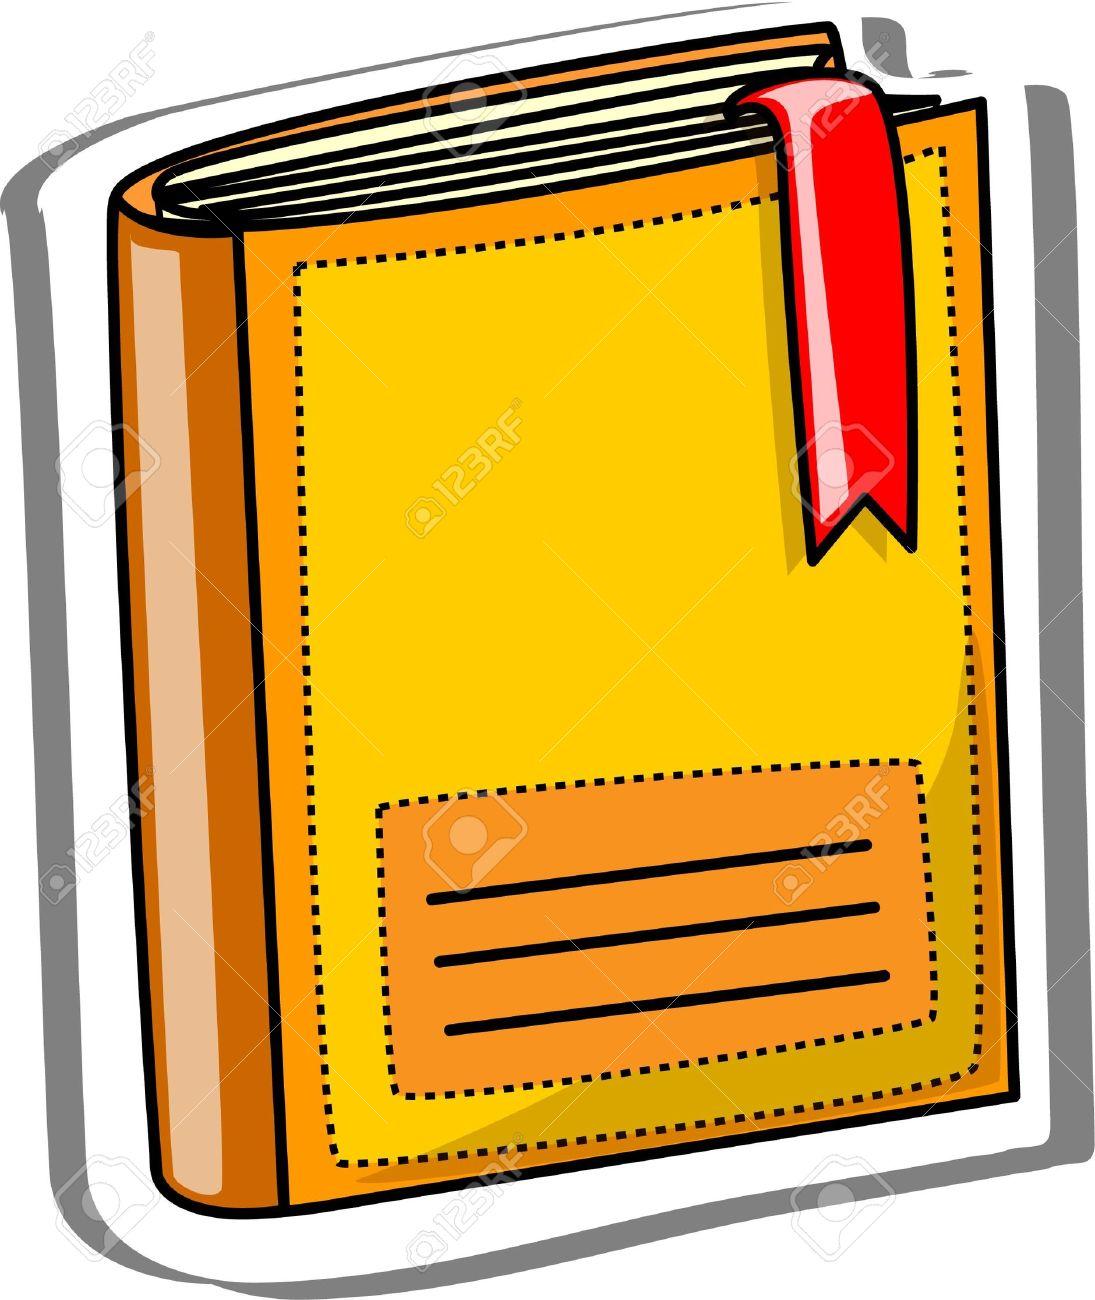 1095x1300 Notebook Clipart Yellow Book